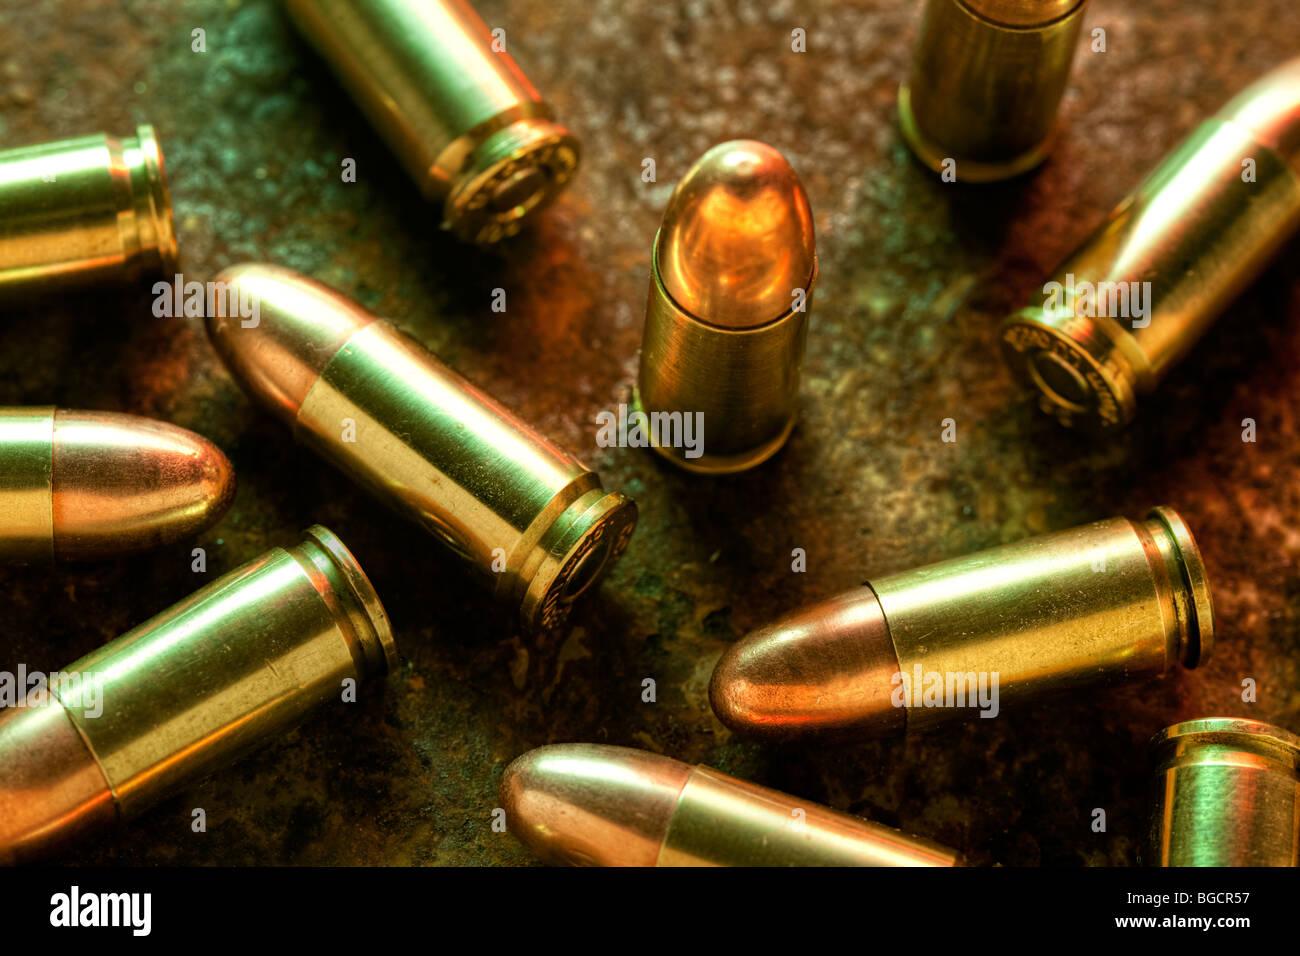 9mm cartridges - Stock Image